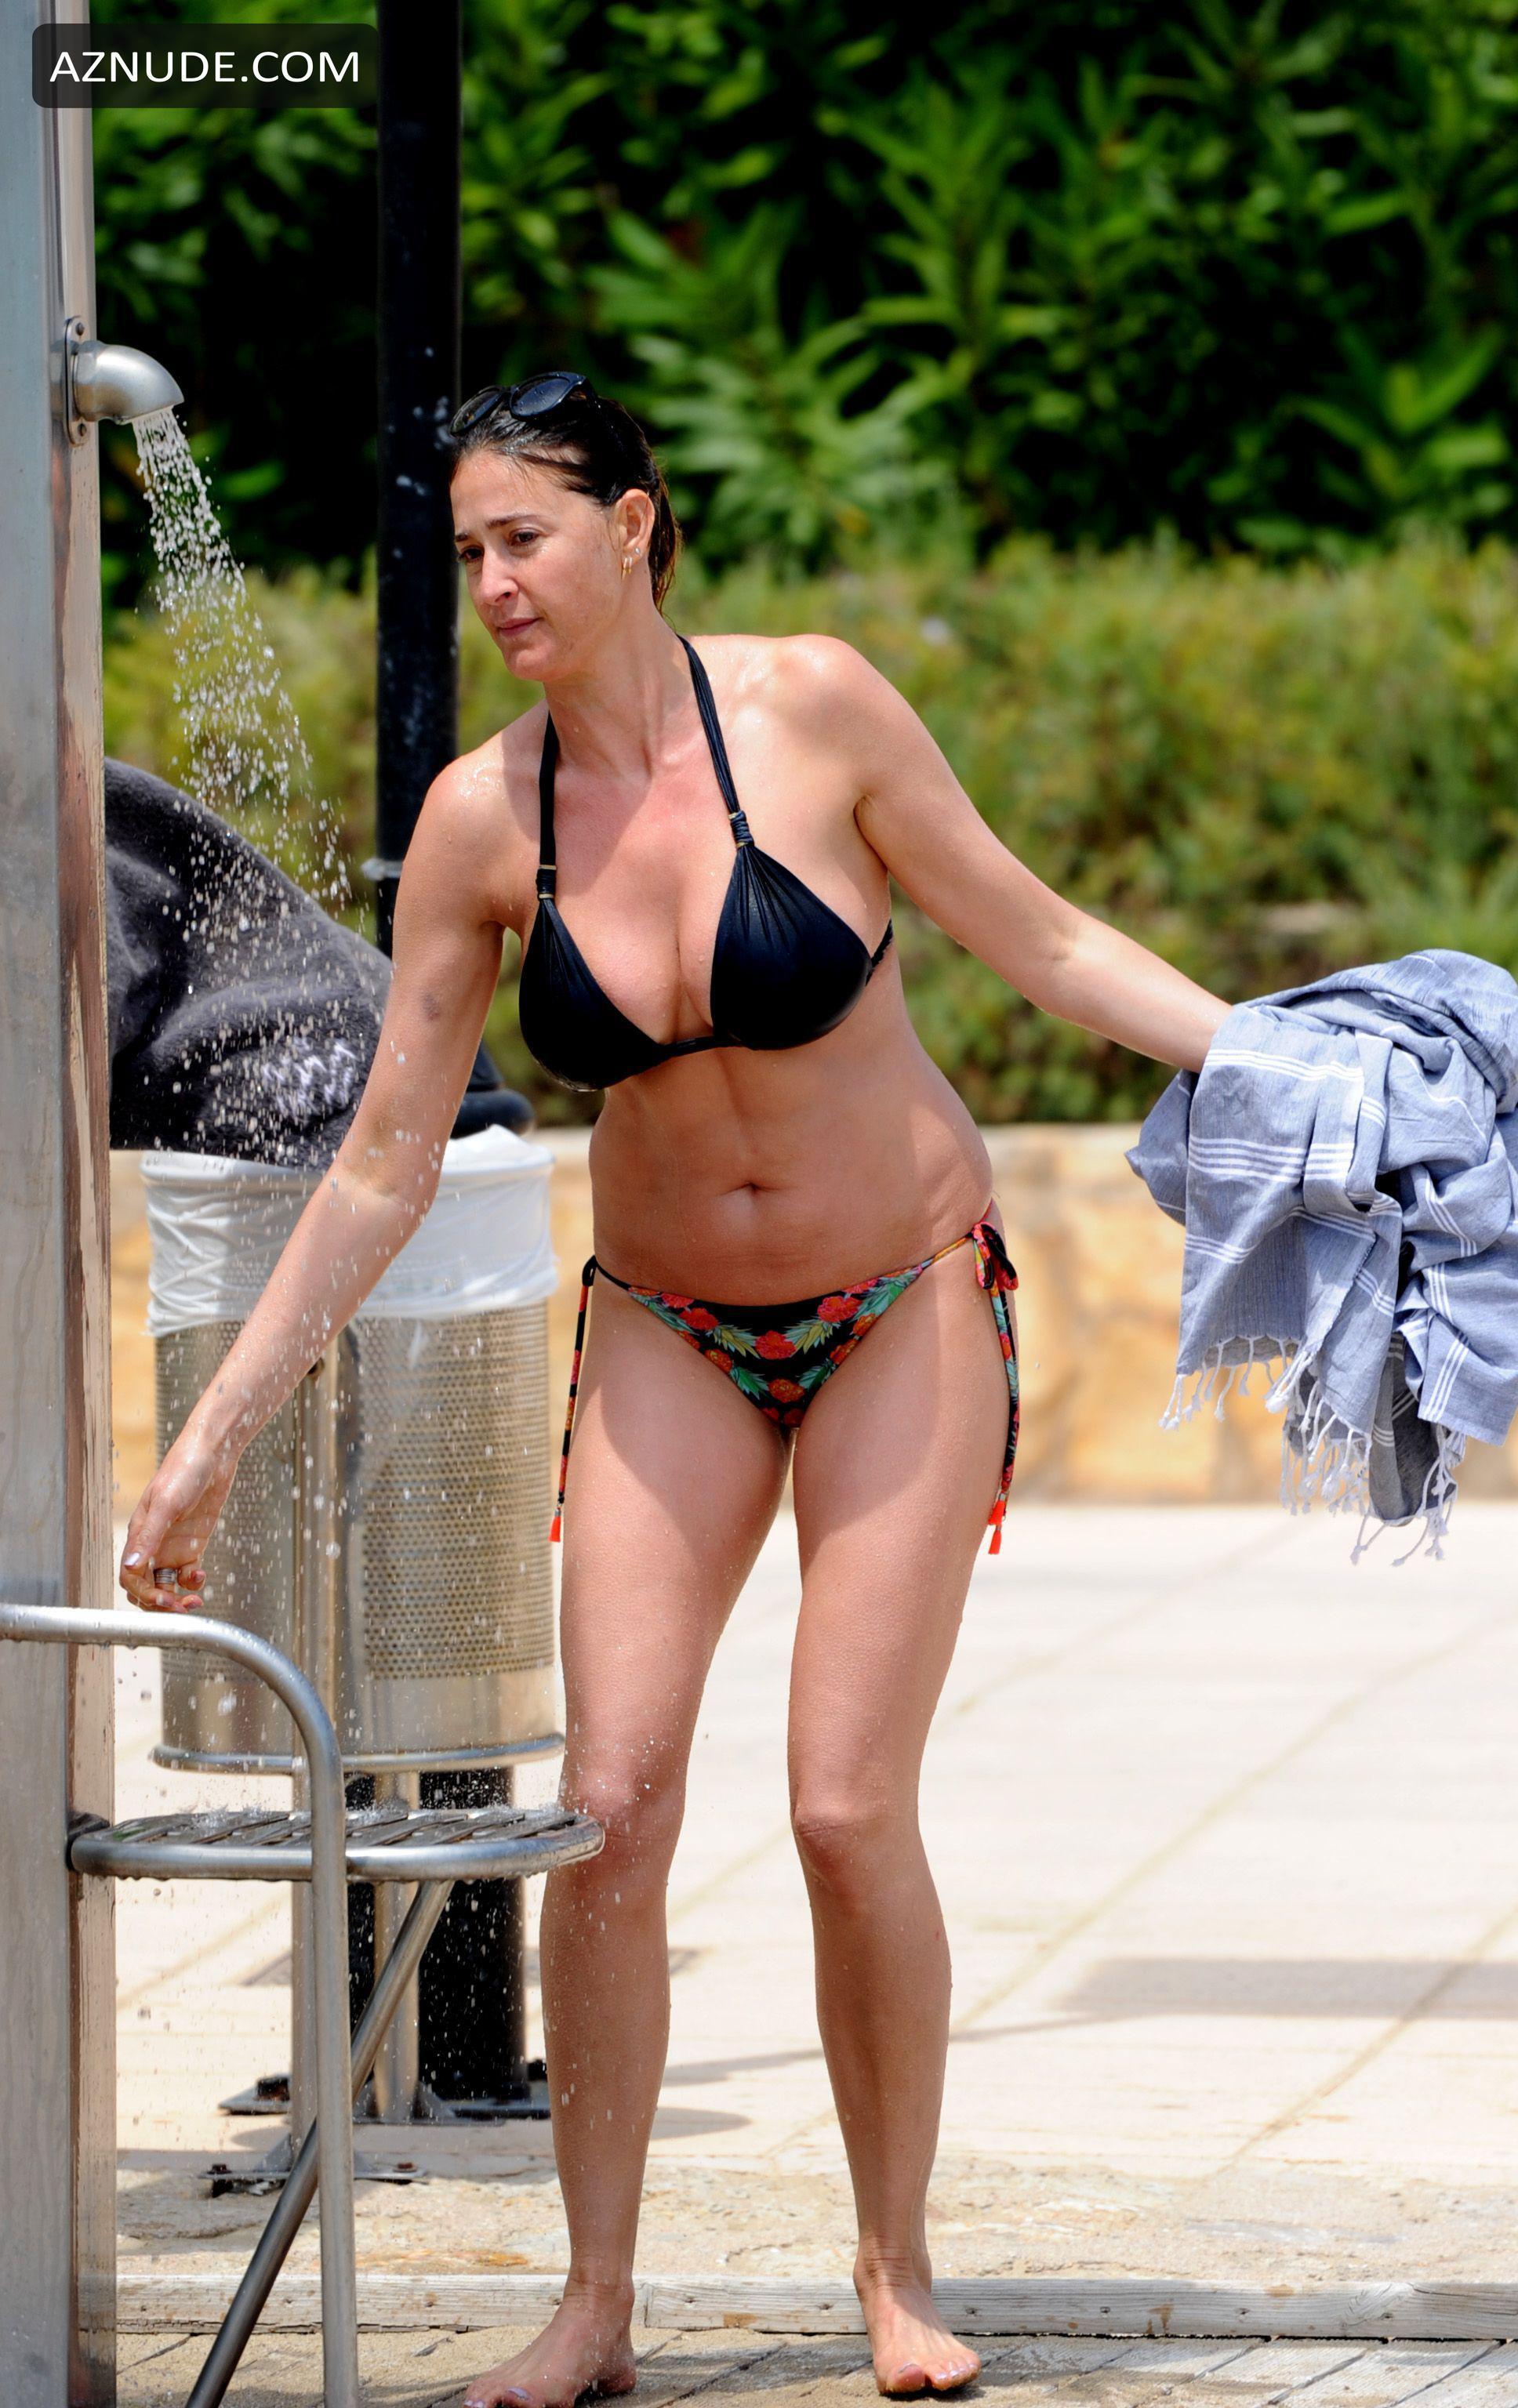 lisa at nude beaches